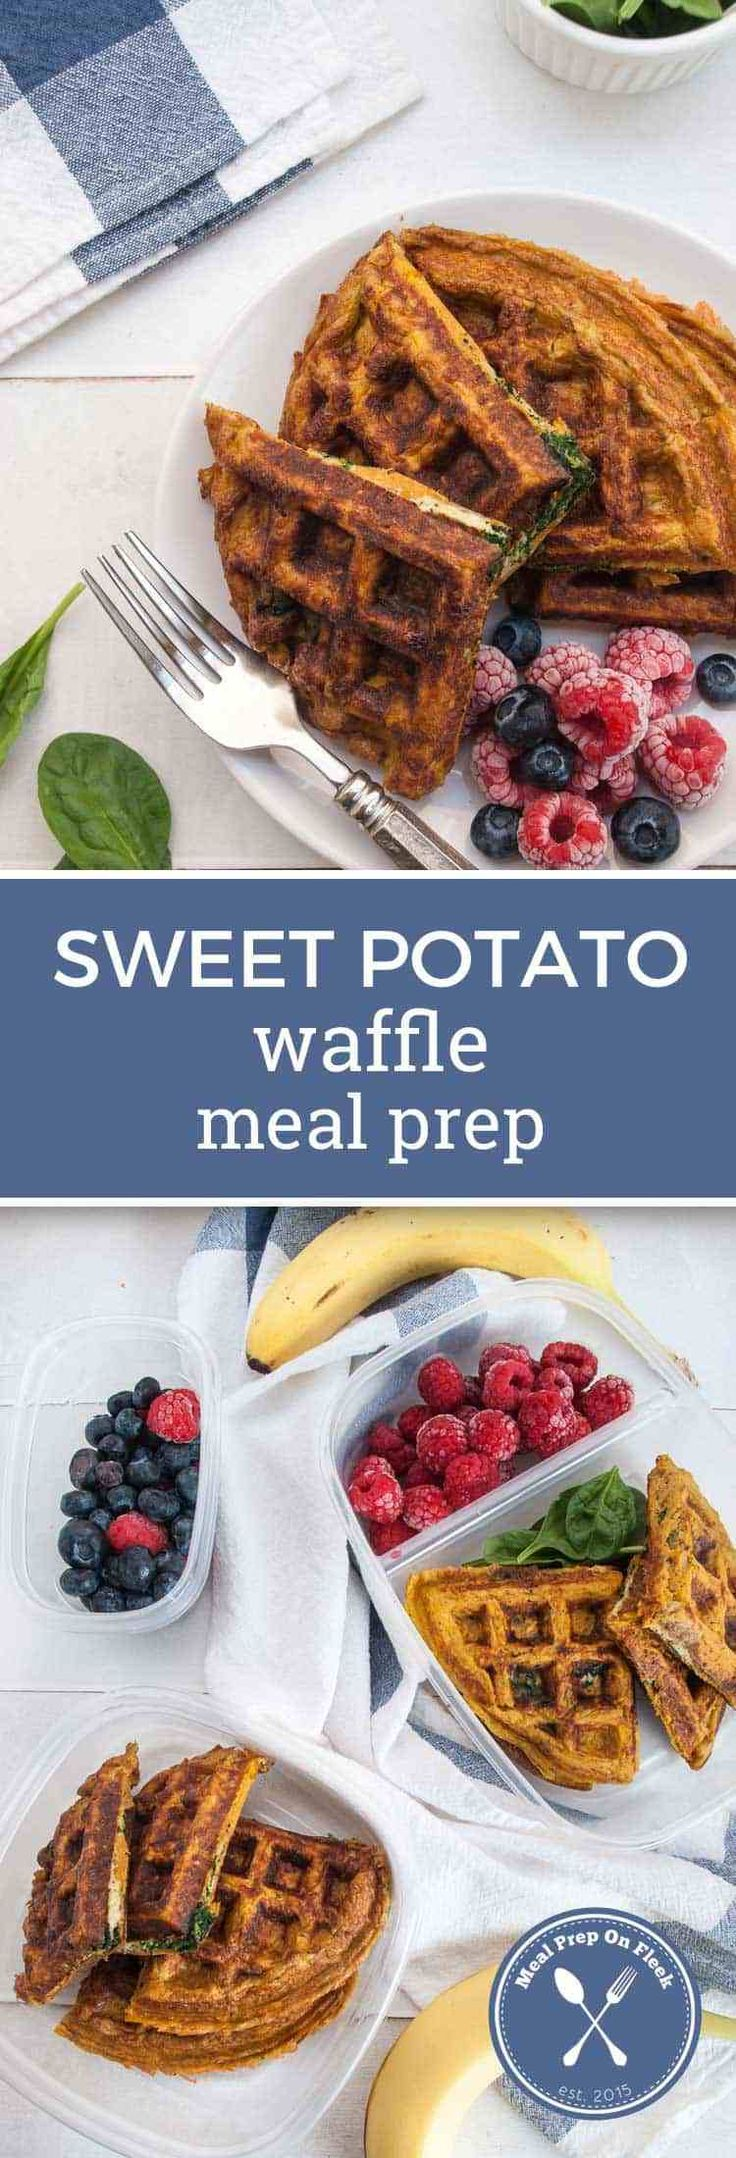 Sweet Potato Waffle Meal Prep - Meal Prep on Fleek